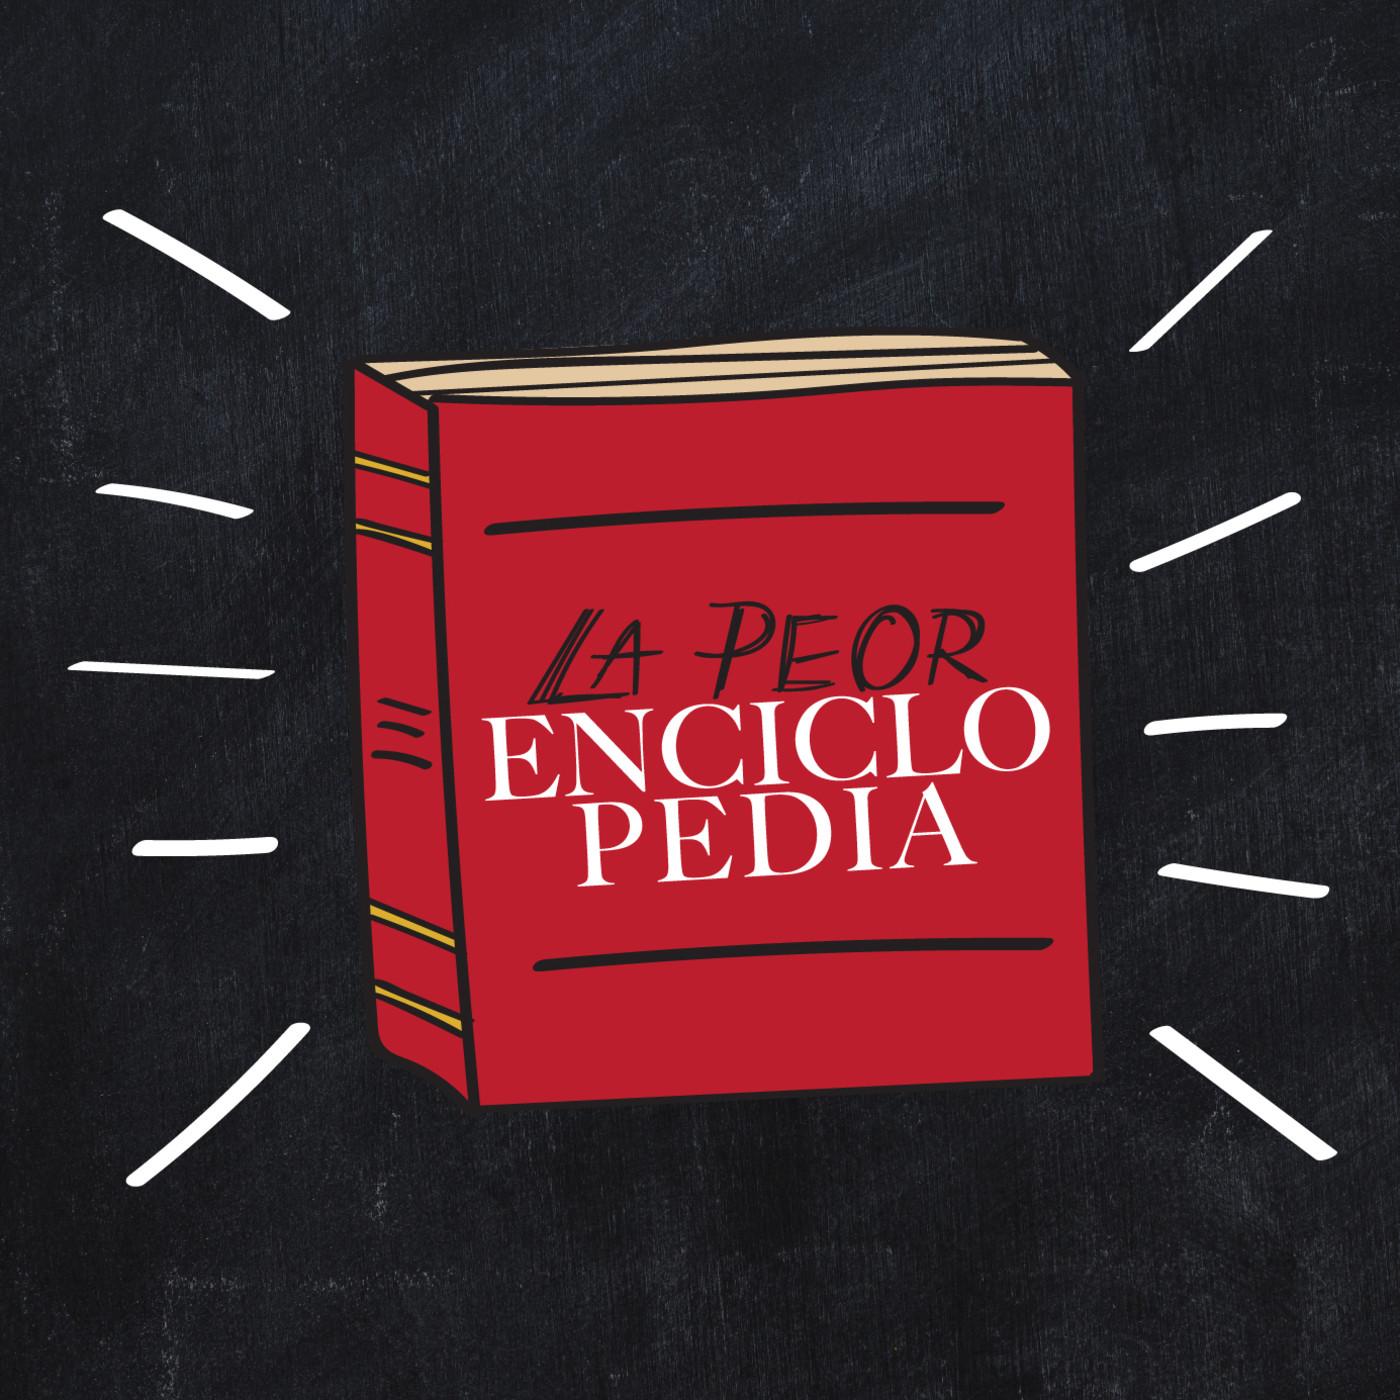 Escucha La Peor Enciclopedia Ivoox